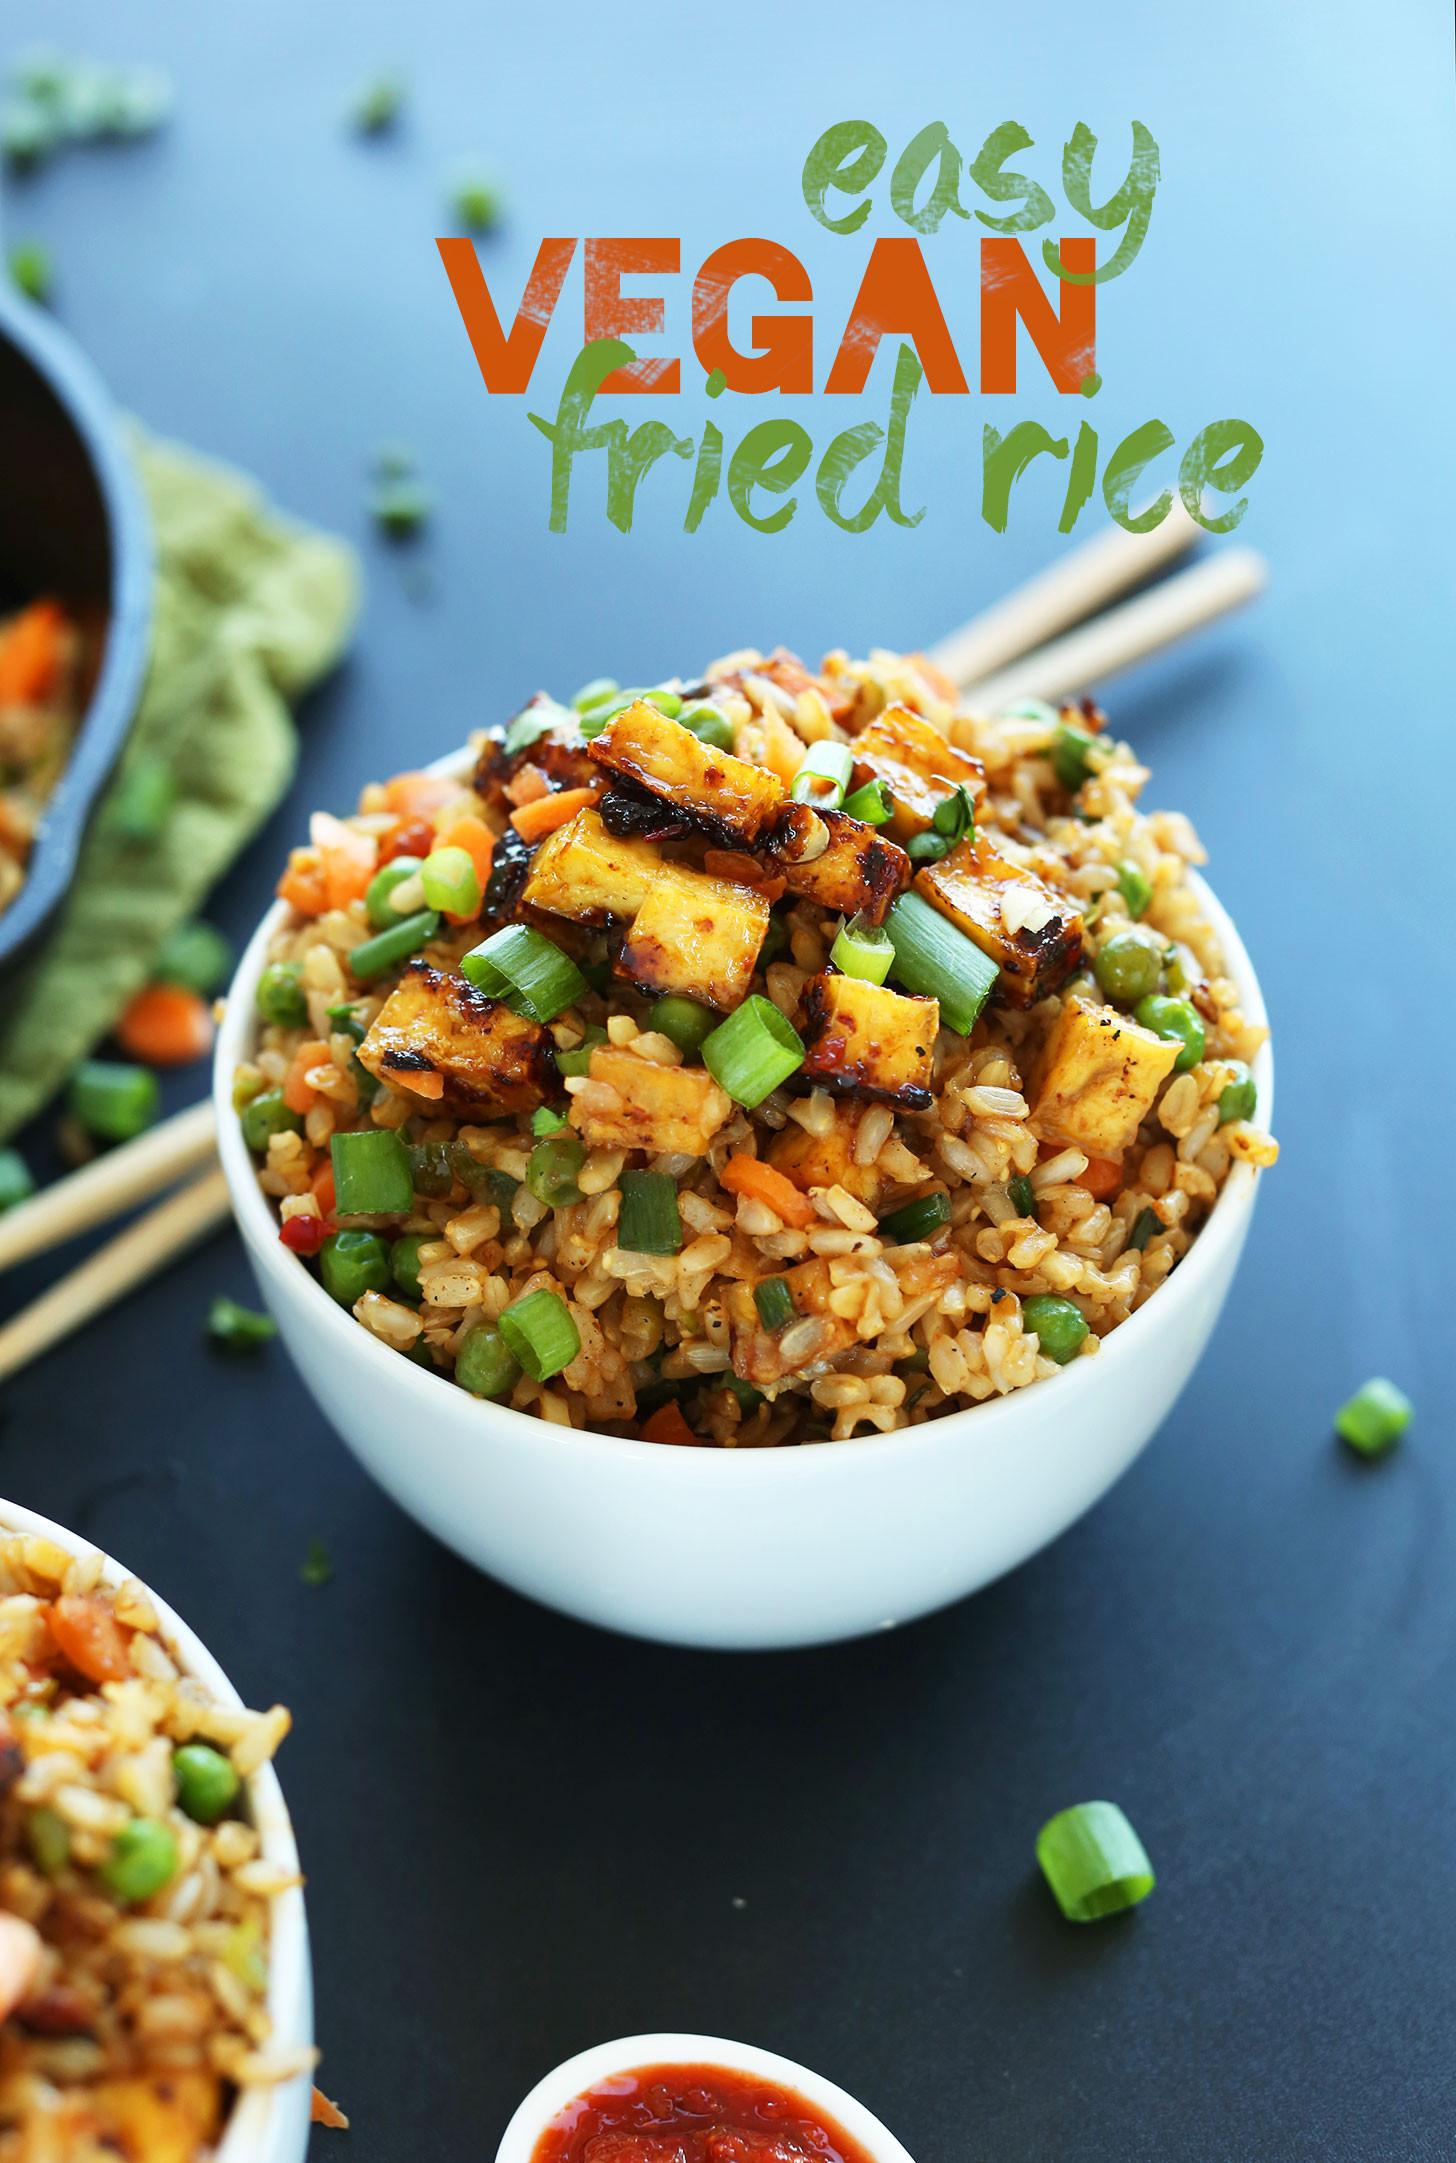 Vegetarian Recipes Video  Vegan Fried Rice